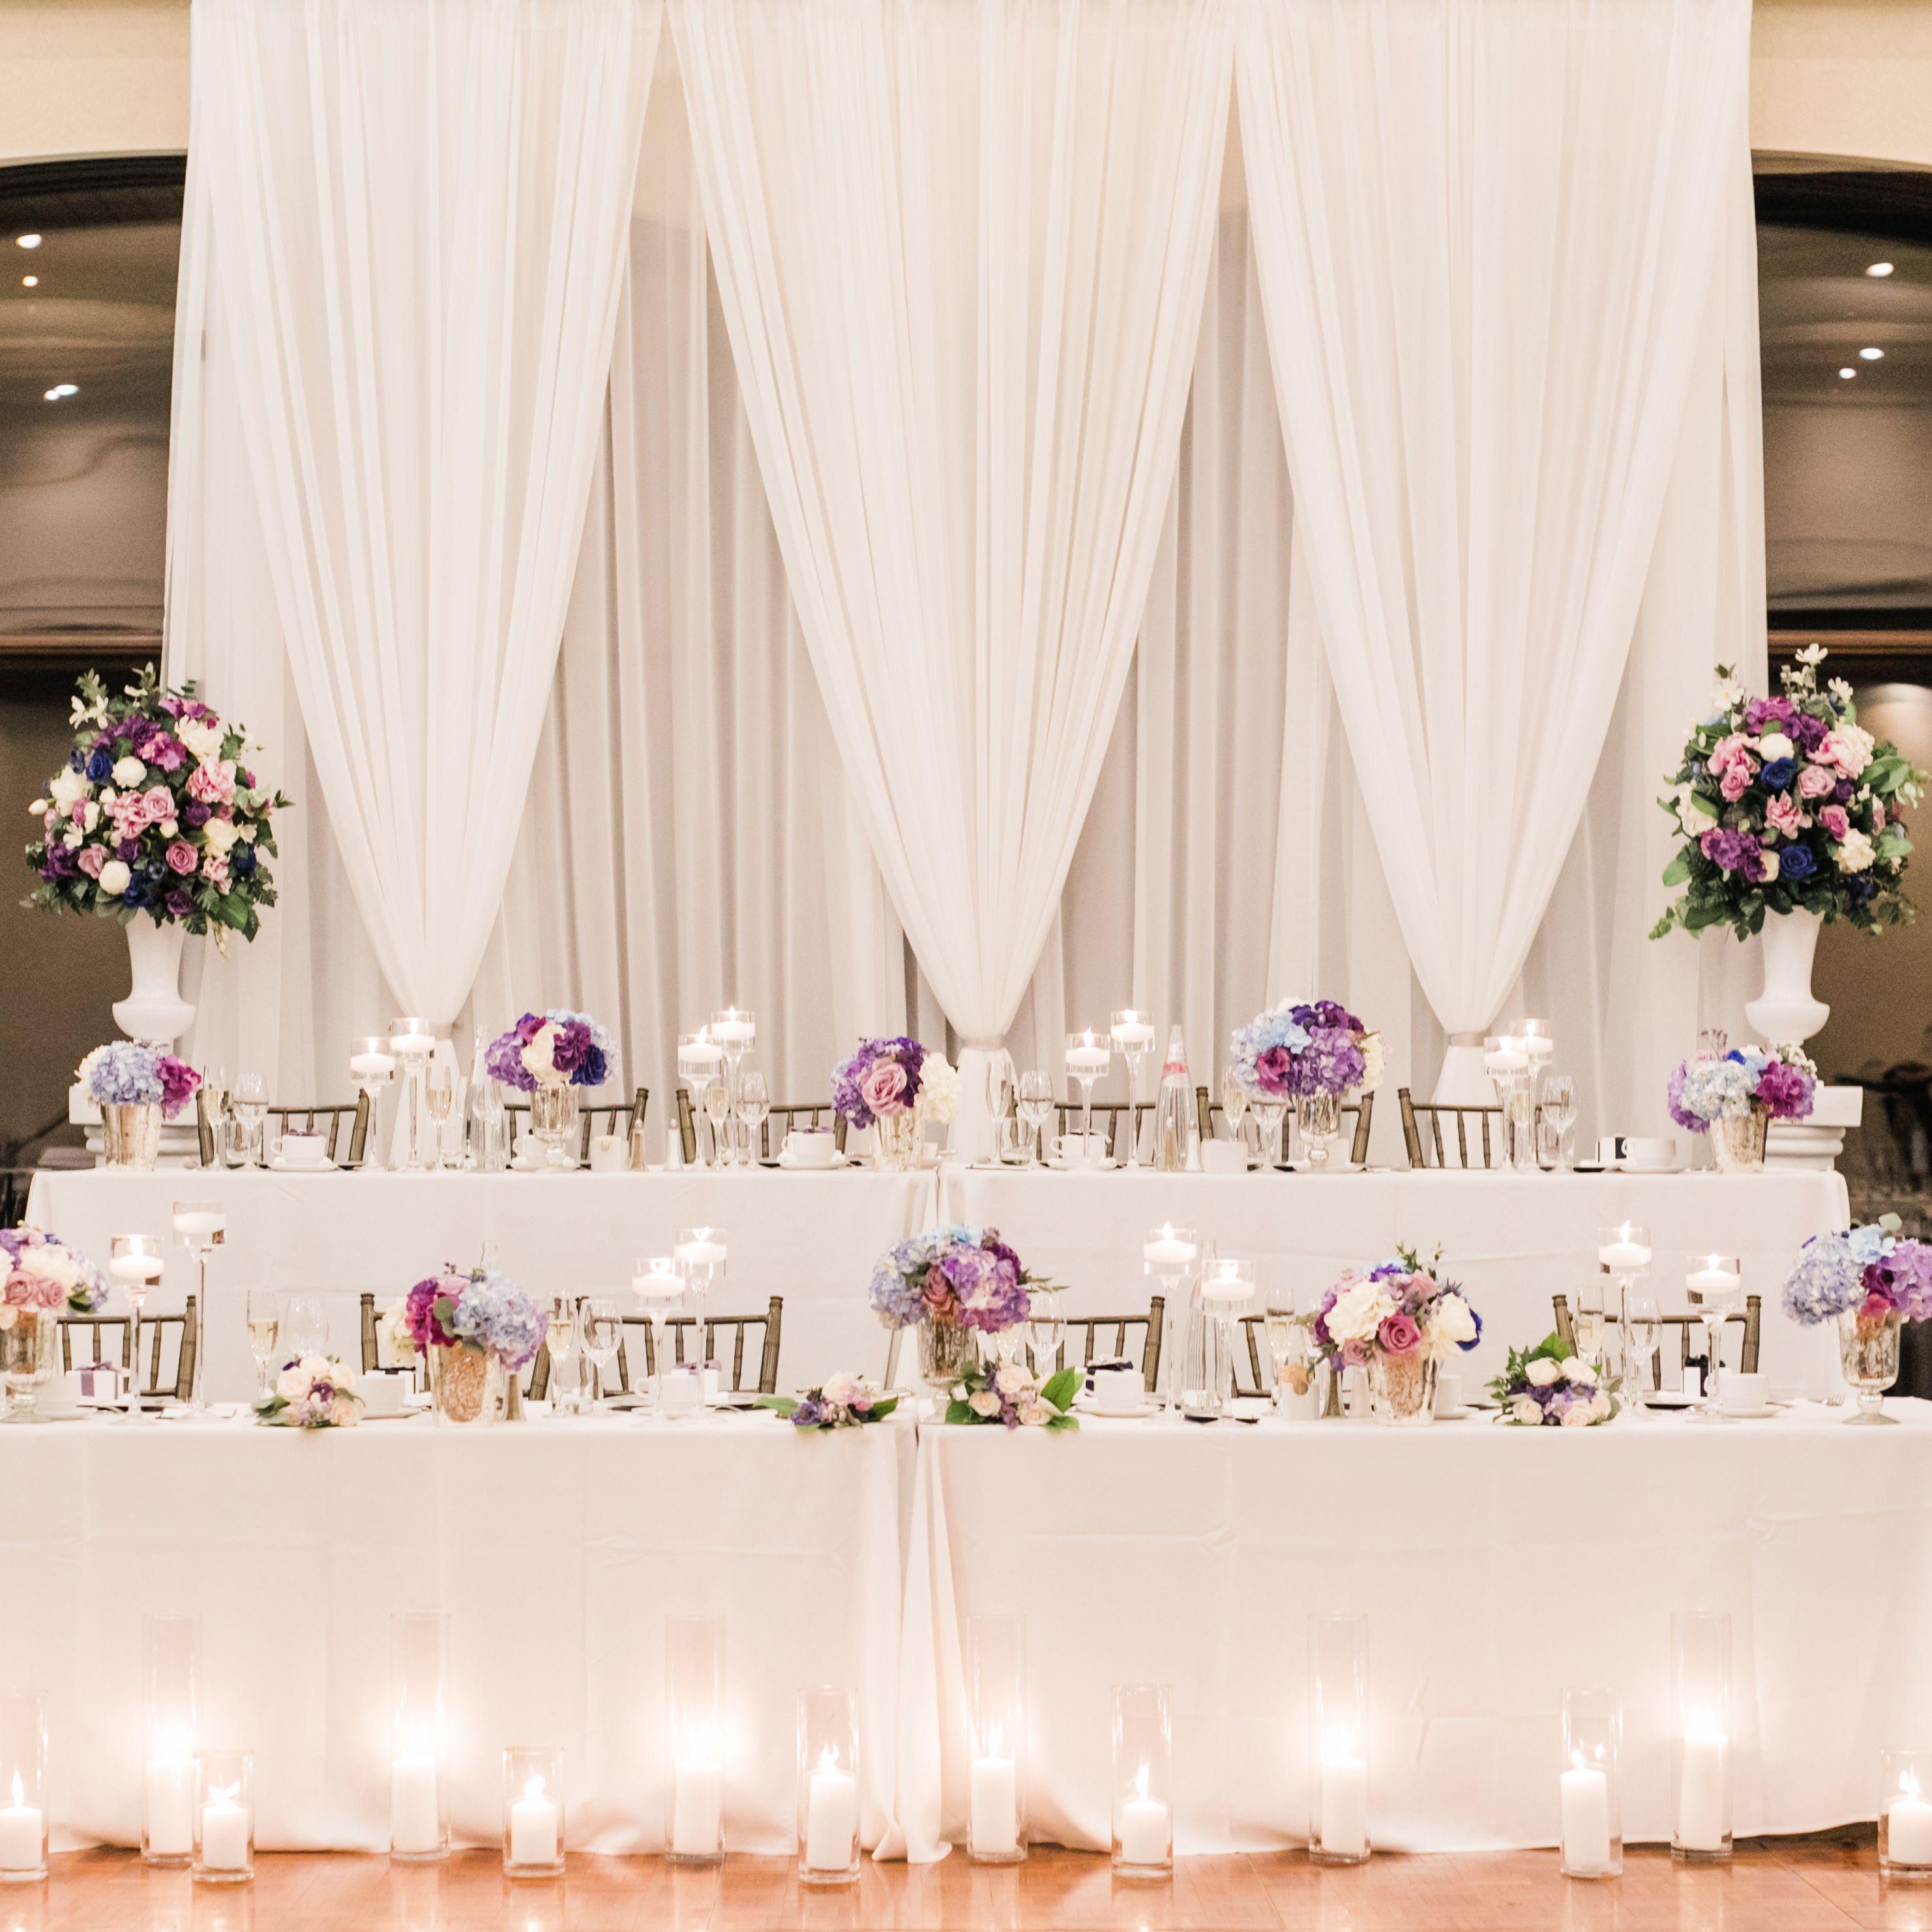 Antonette White Ivory Sheer Drapery Backdrop Rental Rental Vintagebash Wedding Wedding Backdrop Rentals Wedding Decorations